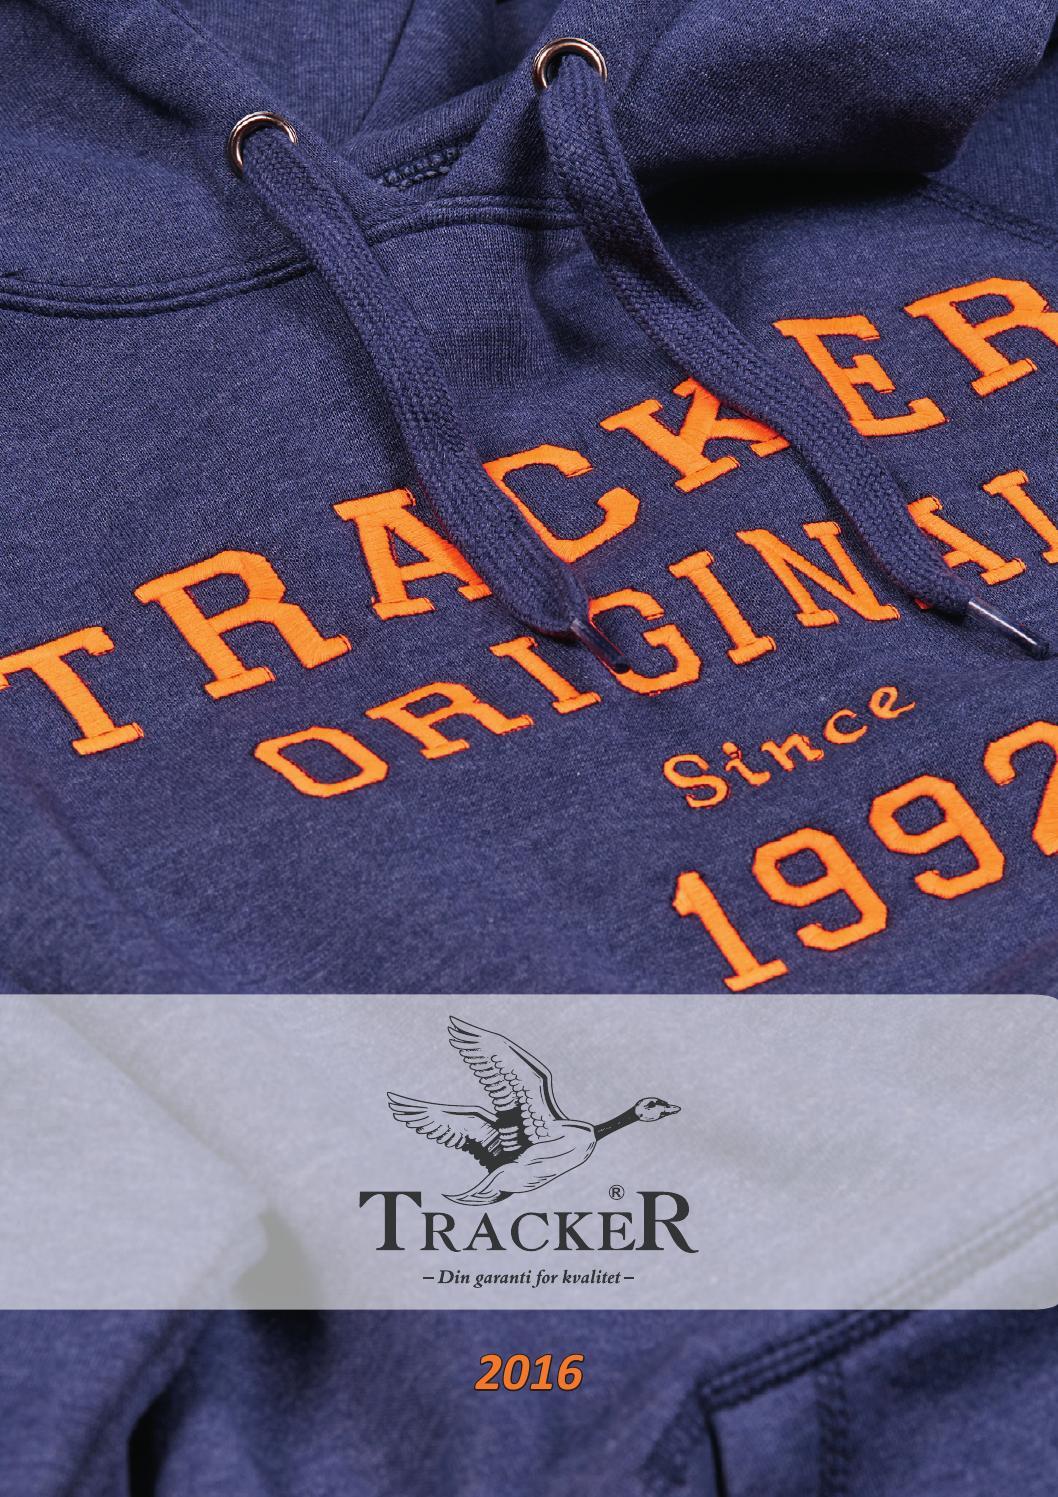 4988dbf5 Tracker katalog 2016 by Reklamehuset - issuu